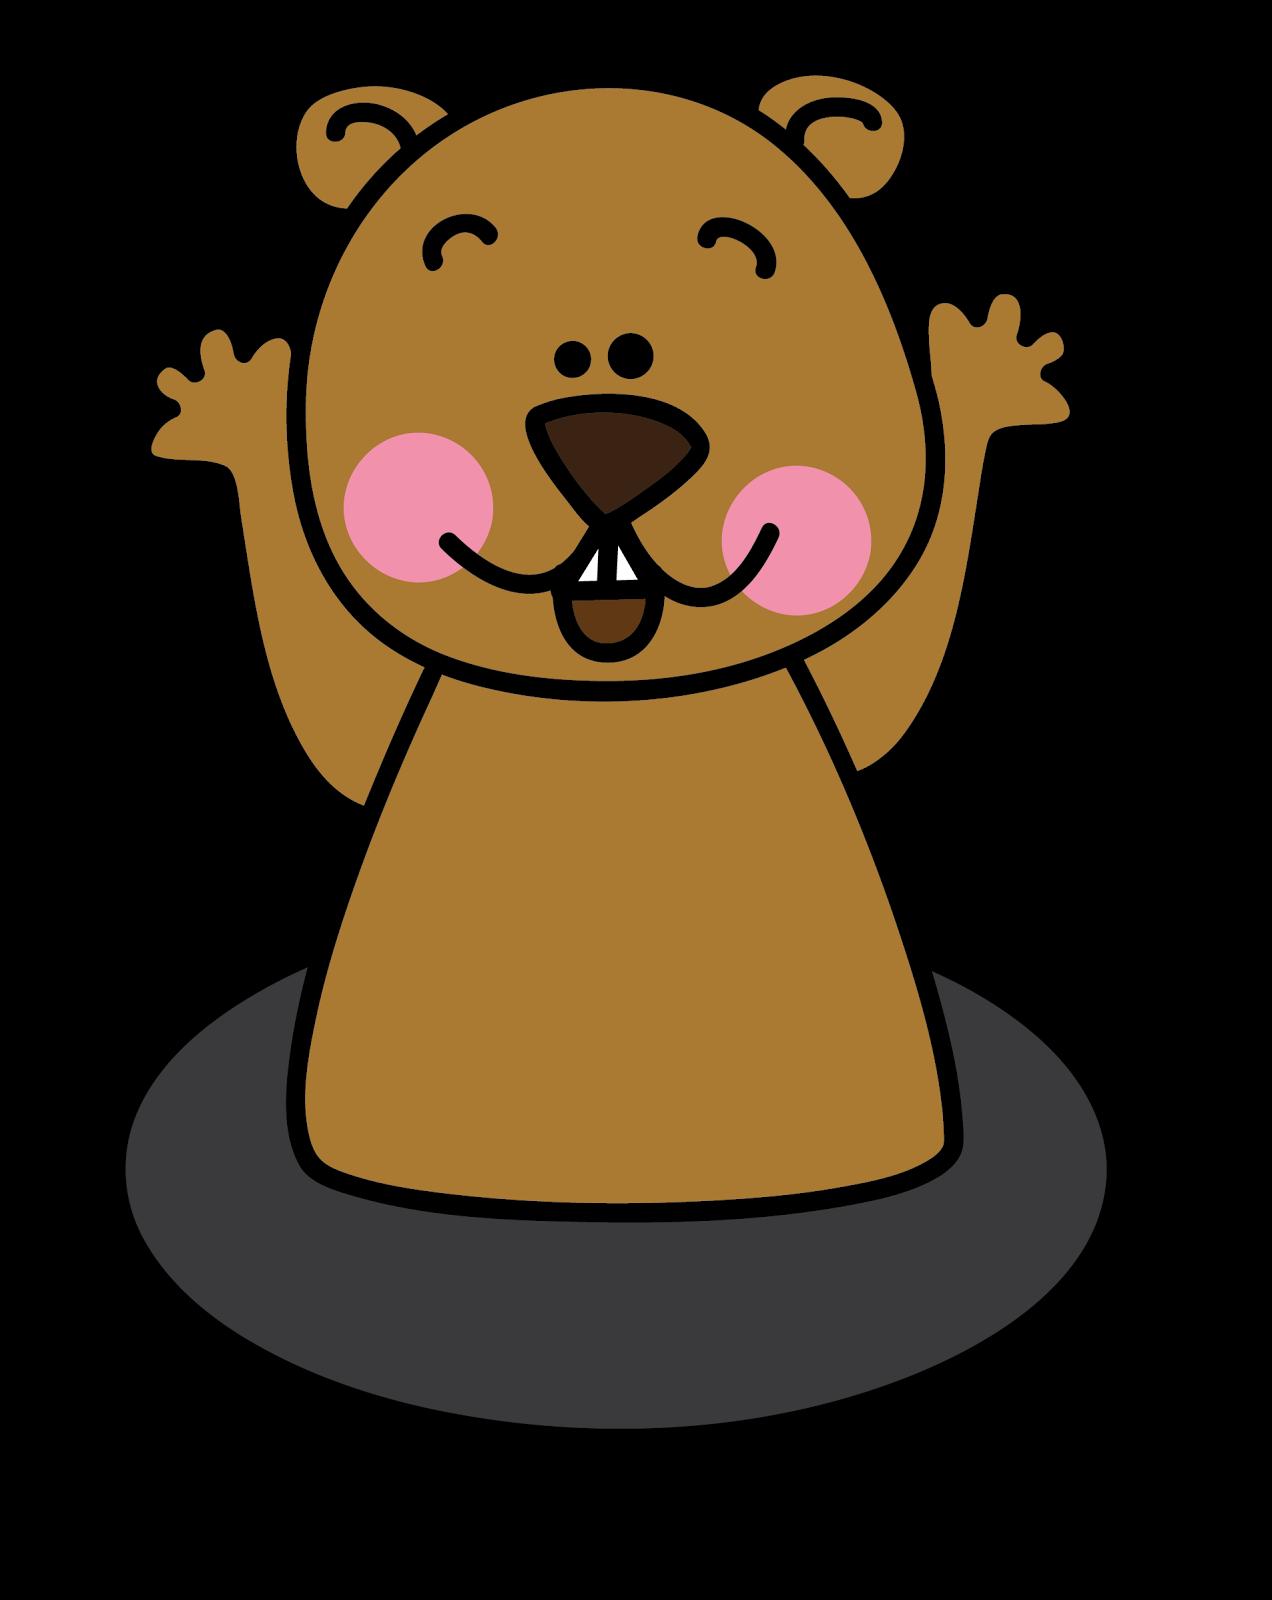 Free Groundhog Clipart-Free Groundhog Clipart-3